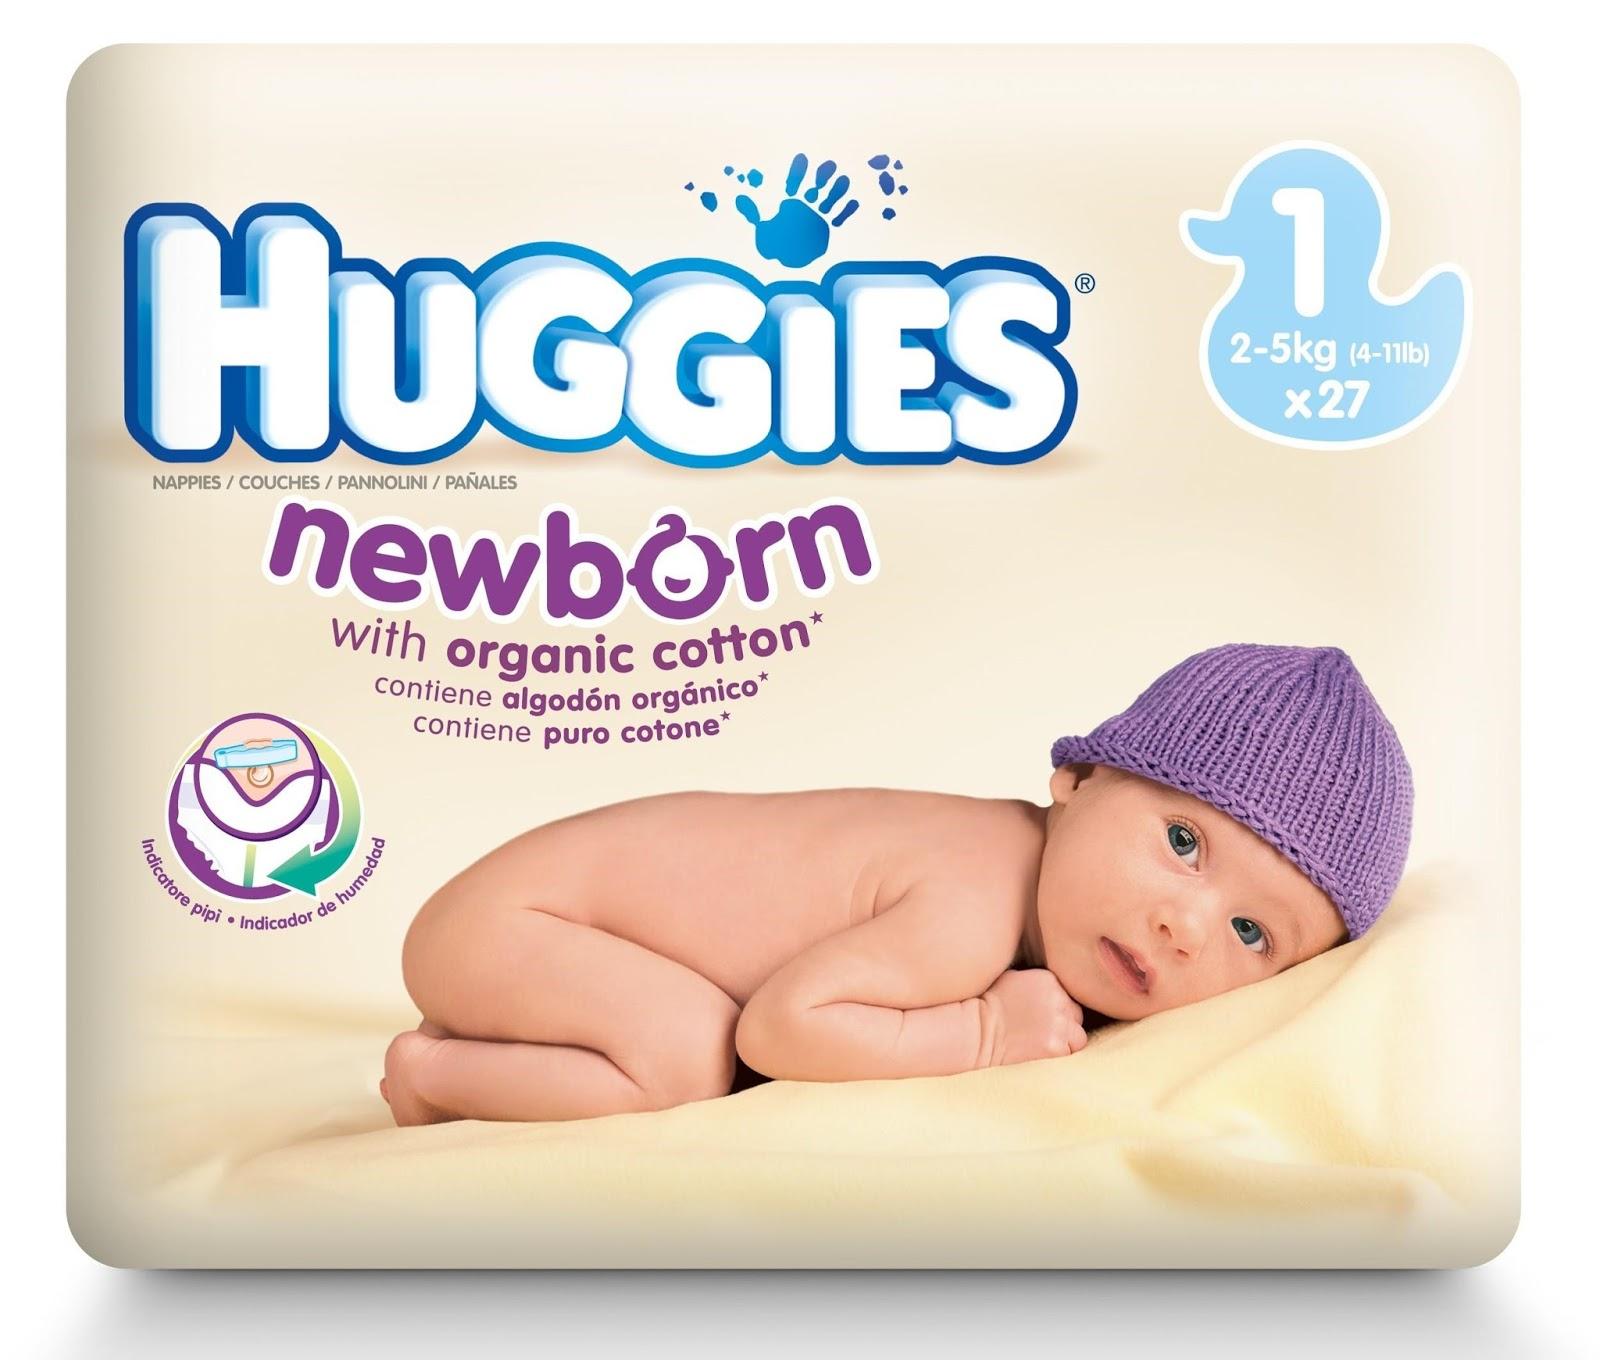 Get Free Sample of Huggies Newborn Babby Diapers - Free Samples ...